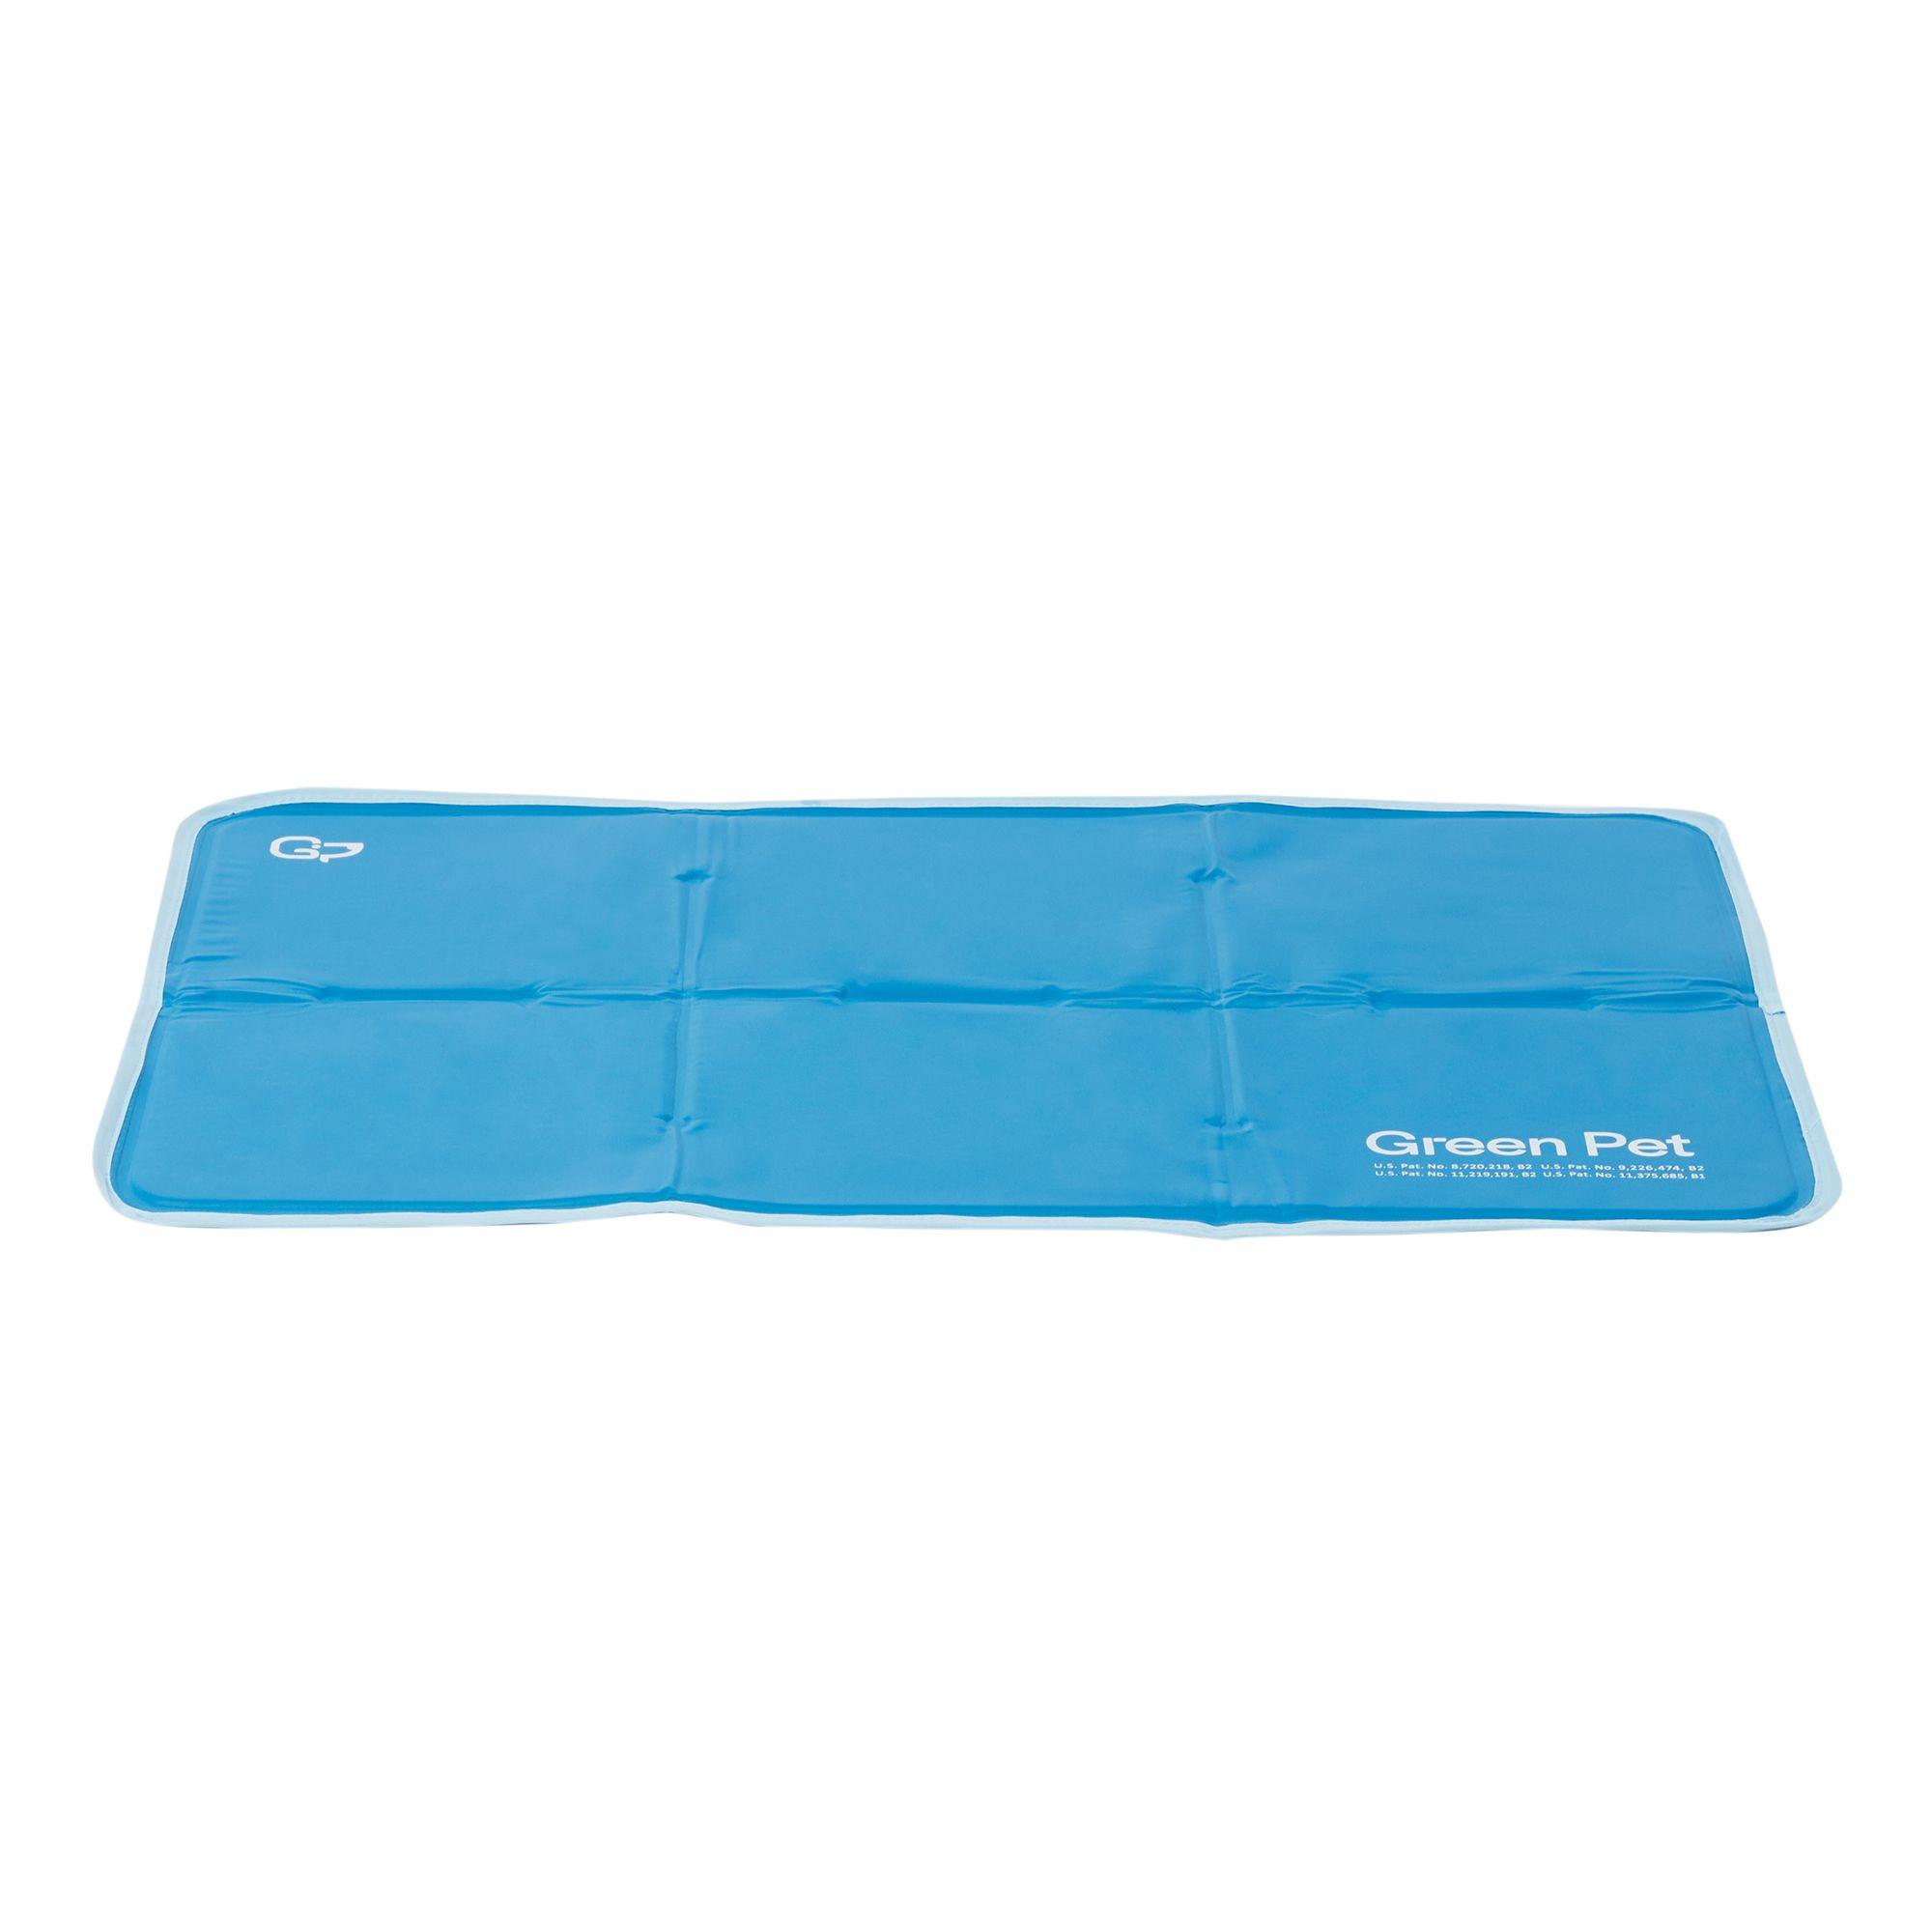 Thegreenpetshop Cool Pet Pad Size 20l X 16w Blue